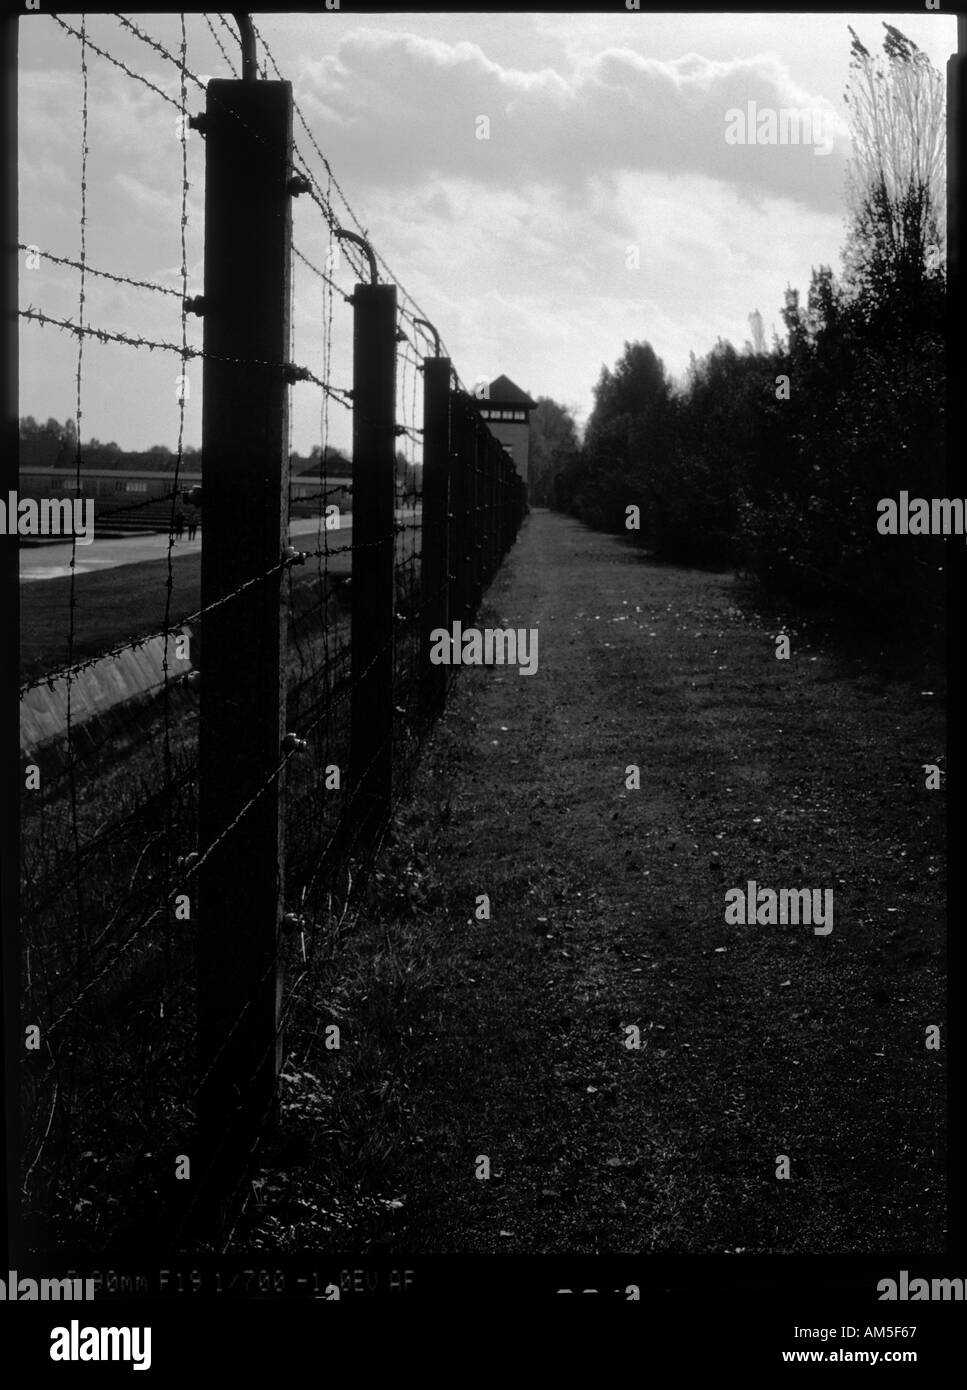 Fence at Dachau - Stock Image